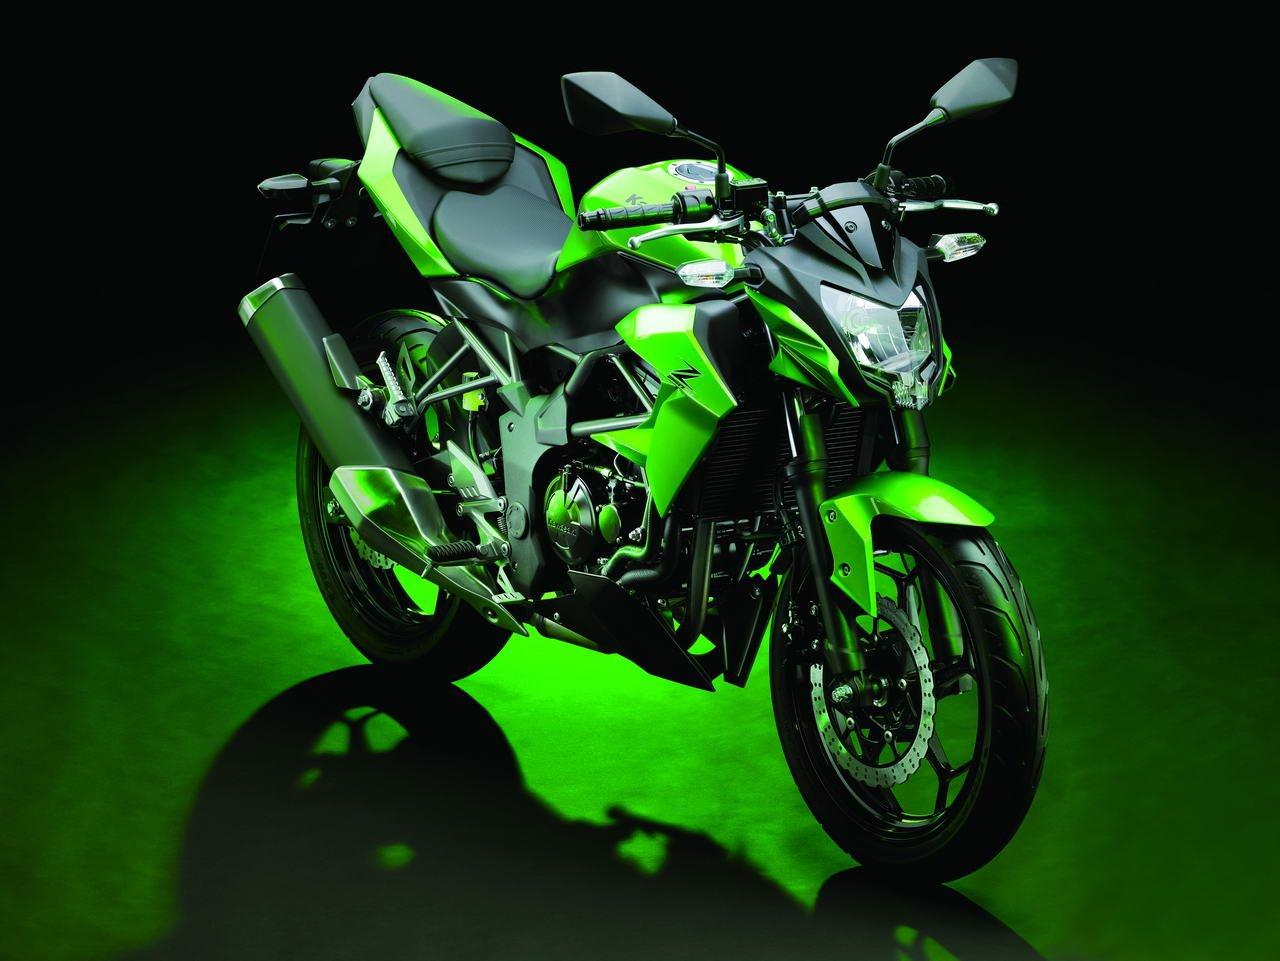 Listino Kawasaki Ninja ZX-10R SuperBike 1000 - image 13628_1 on https://moto.motori.net